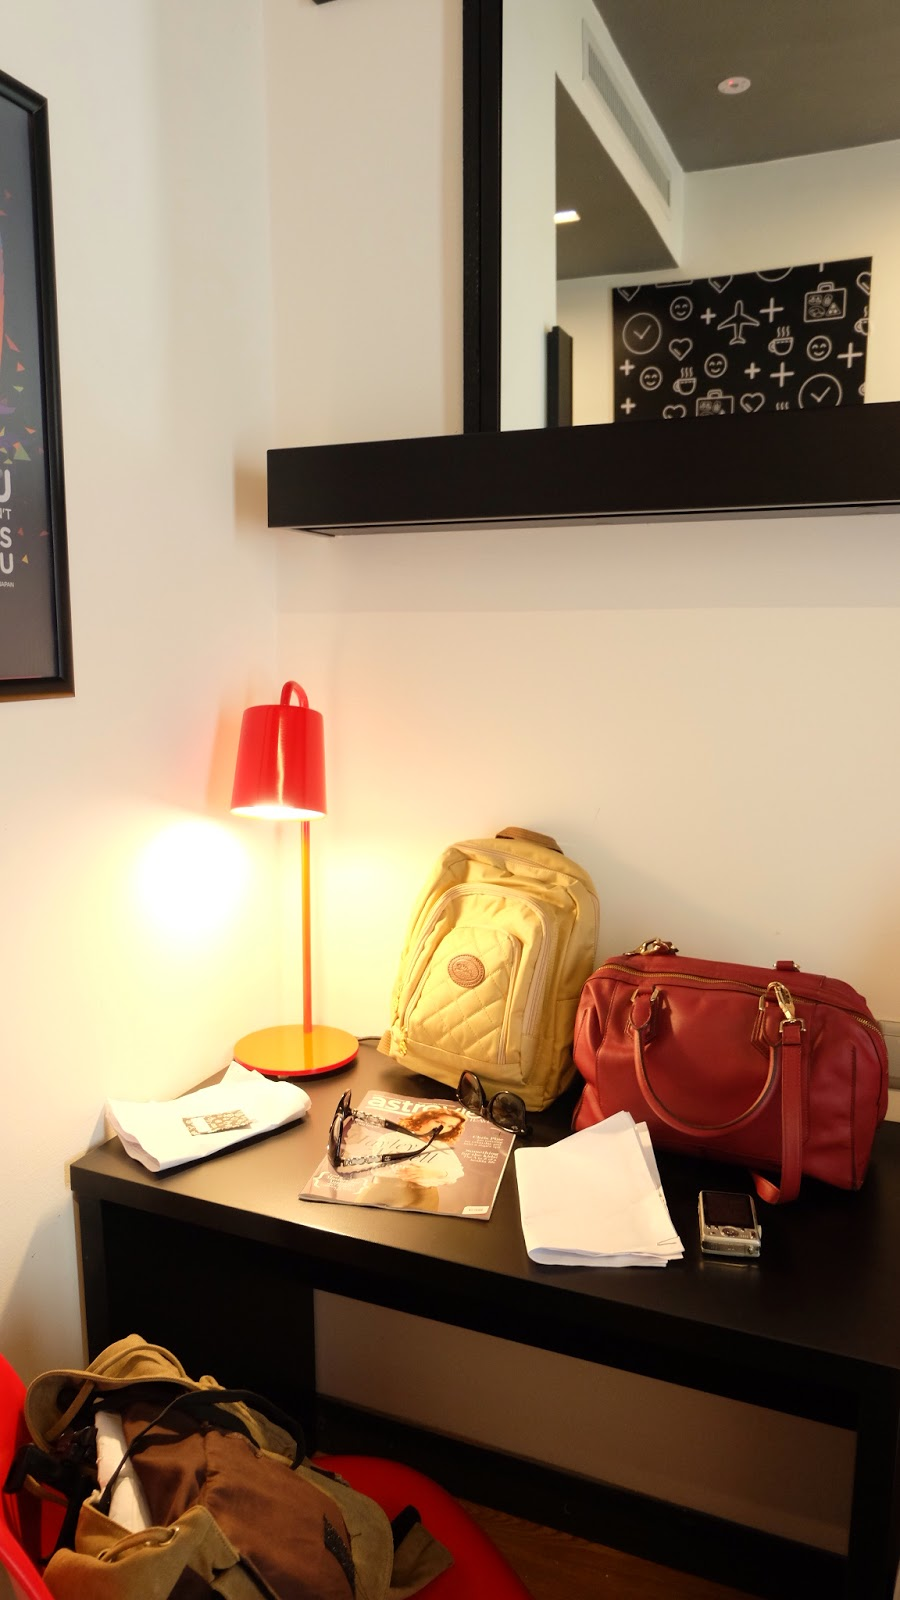 tune hotel klia 2 malaysia review